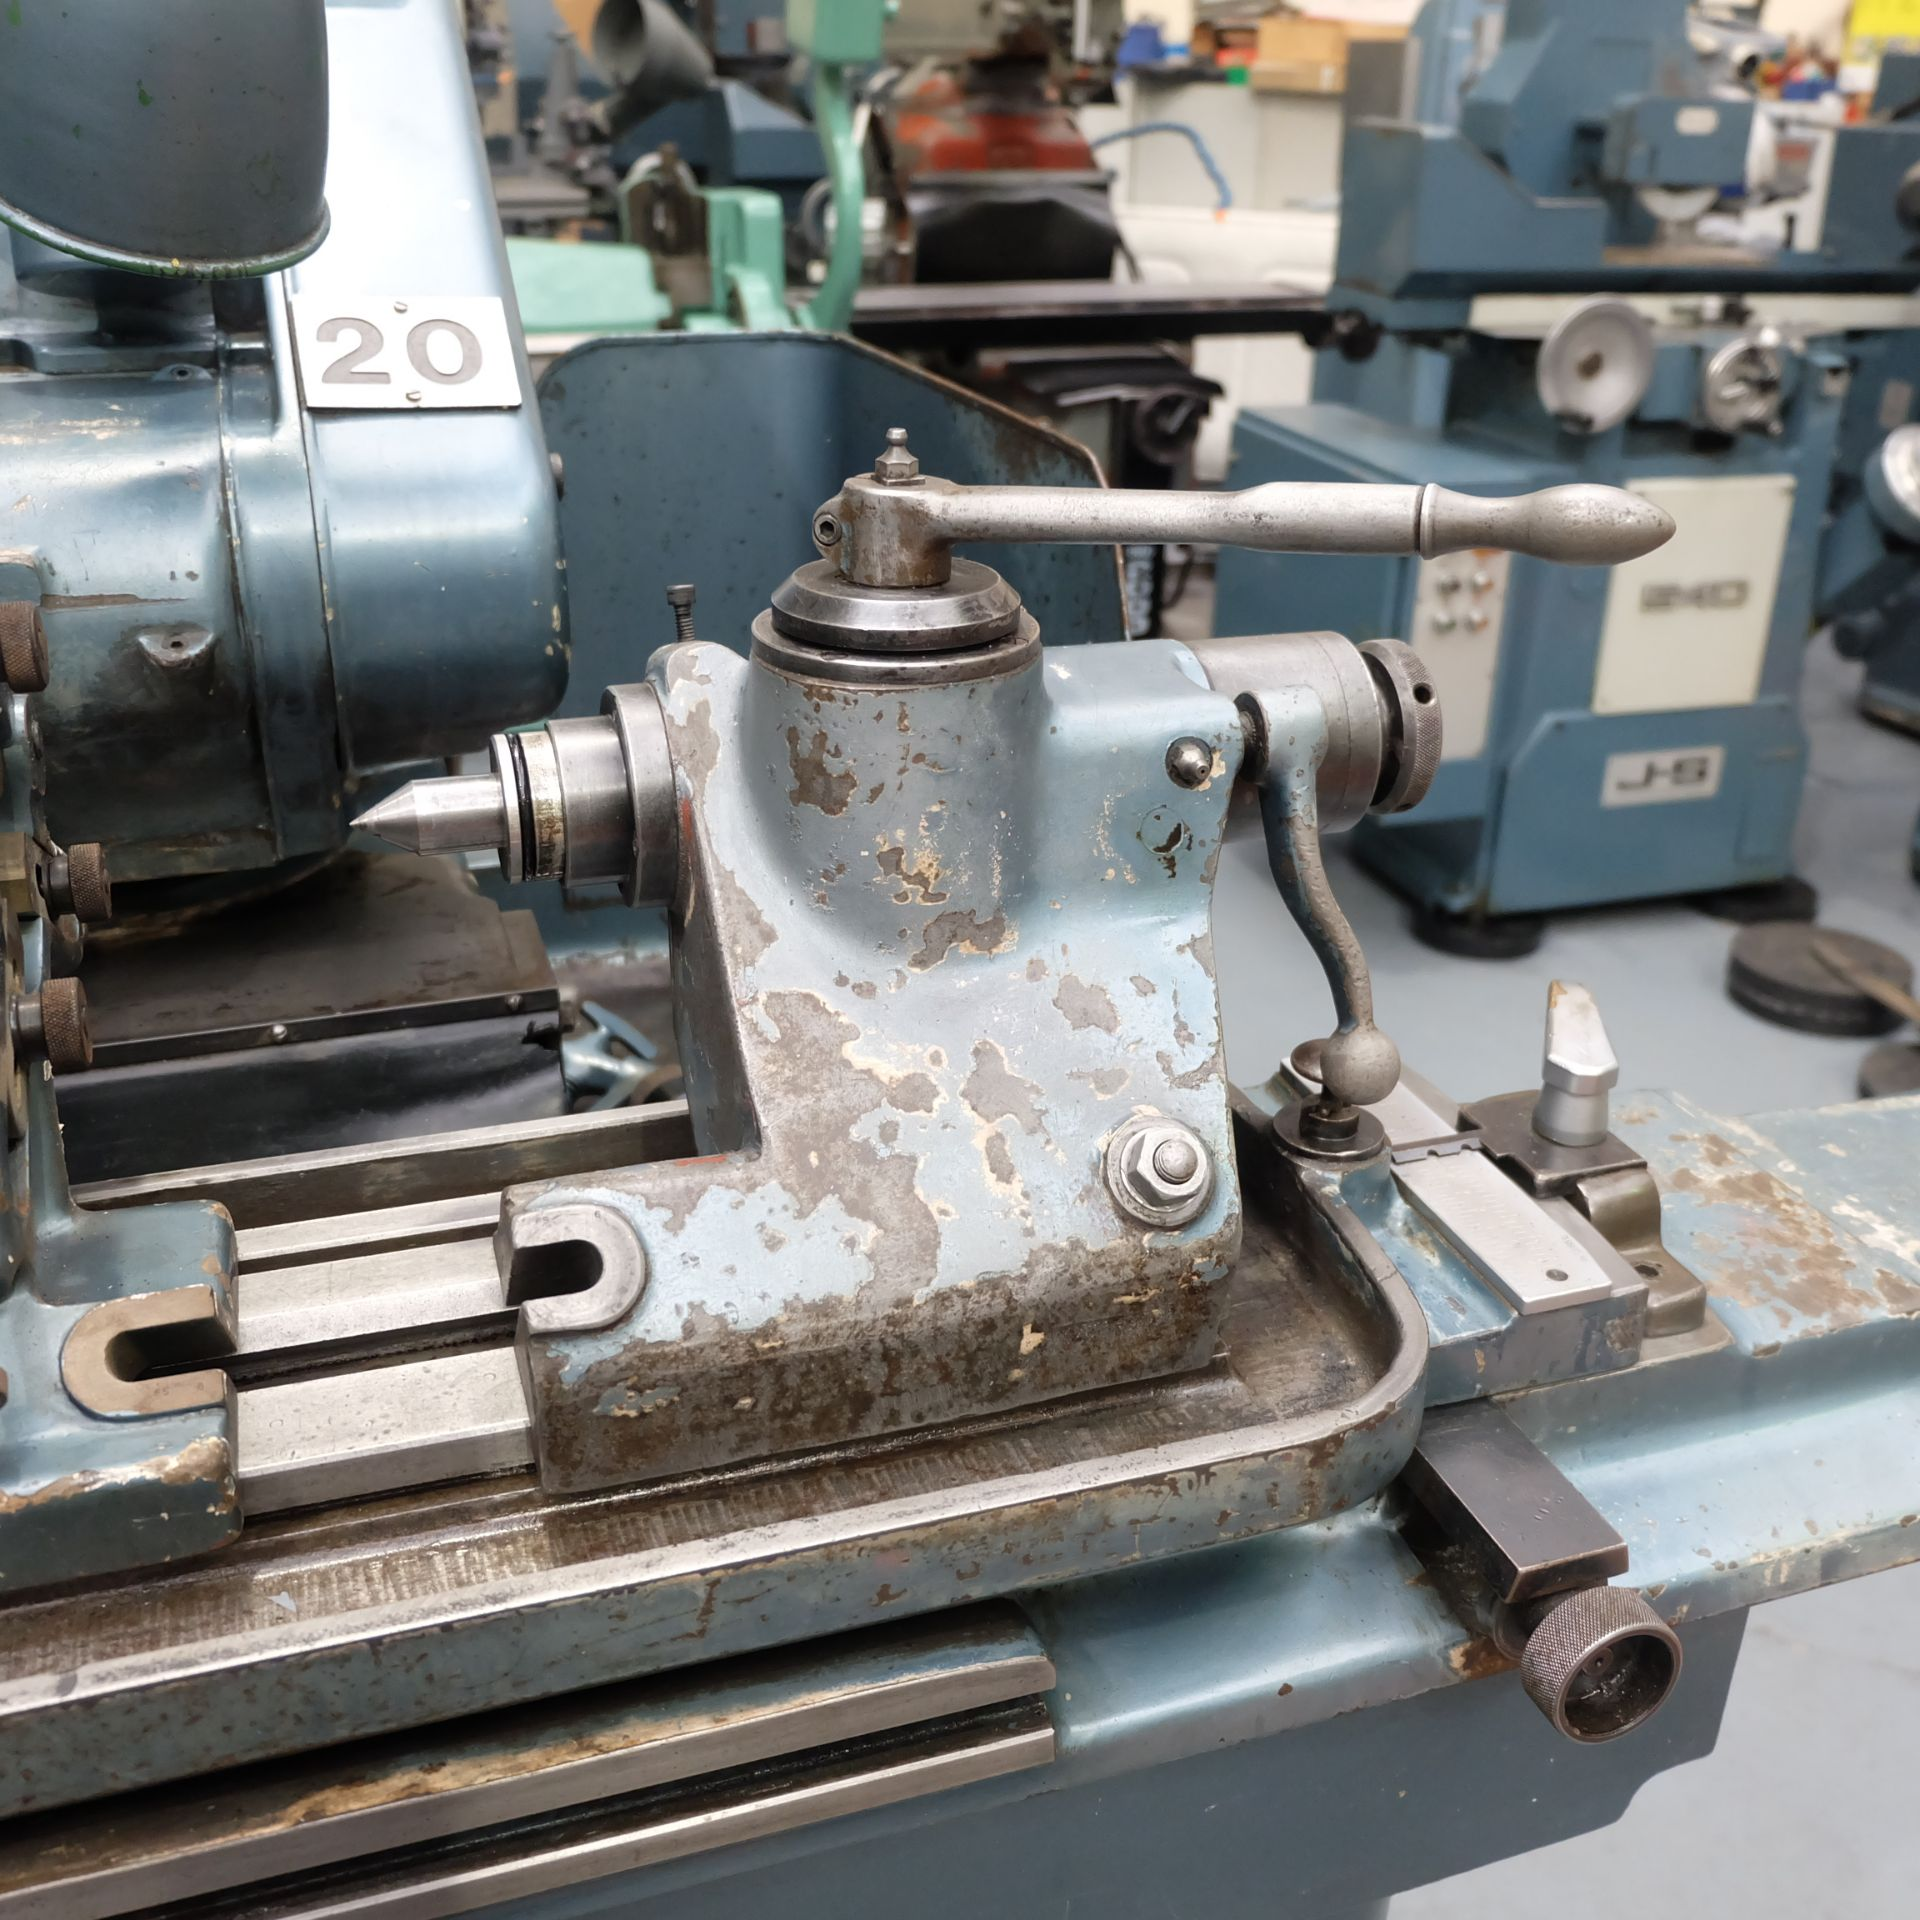 "Jones & Shipman Type 1311 Universal Cylindrical Grinder. 24"" x 10"" Capacity. - Image 4 of 11"